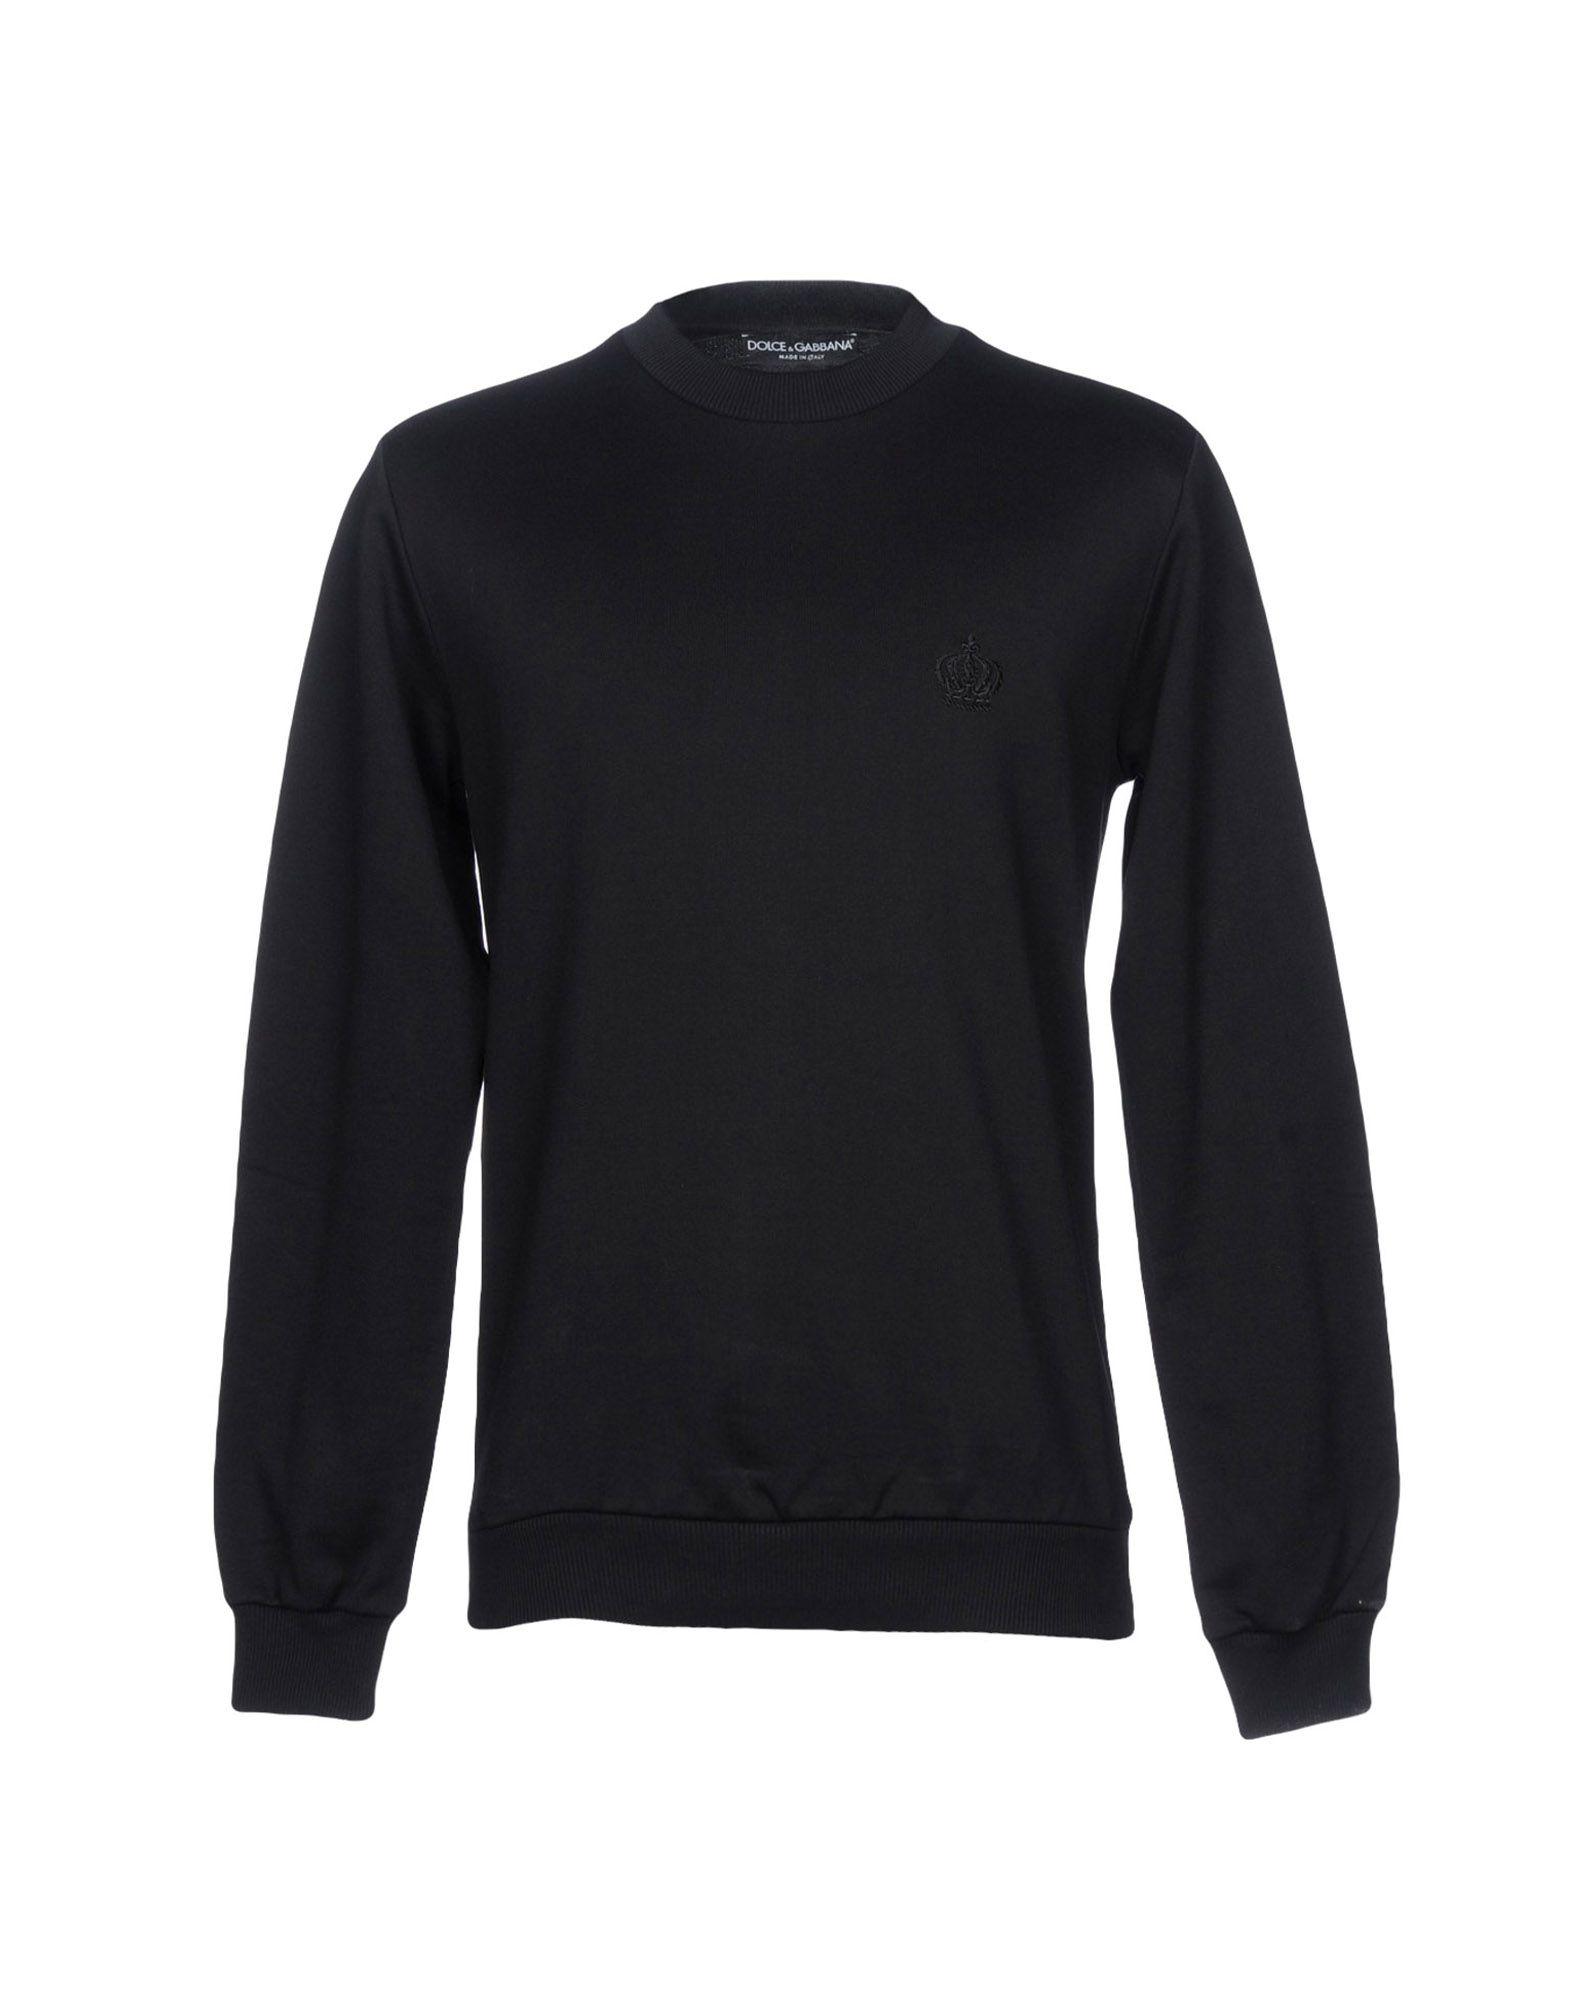 Felpa Dolce & Gabbana Uomo - Acquista online su